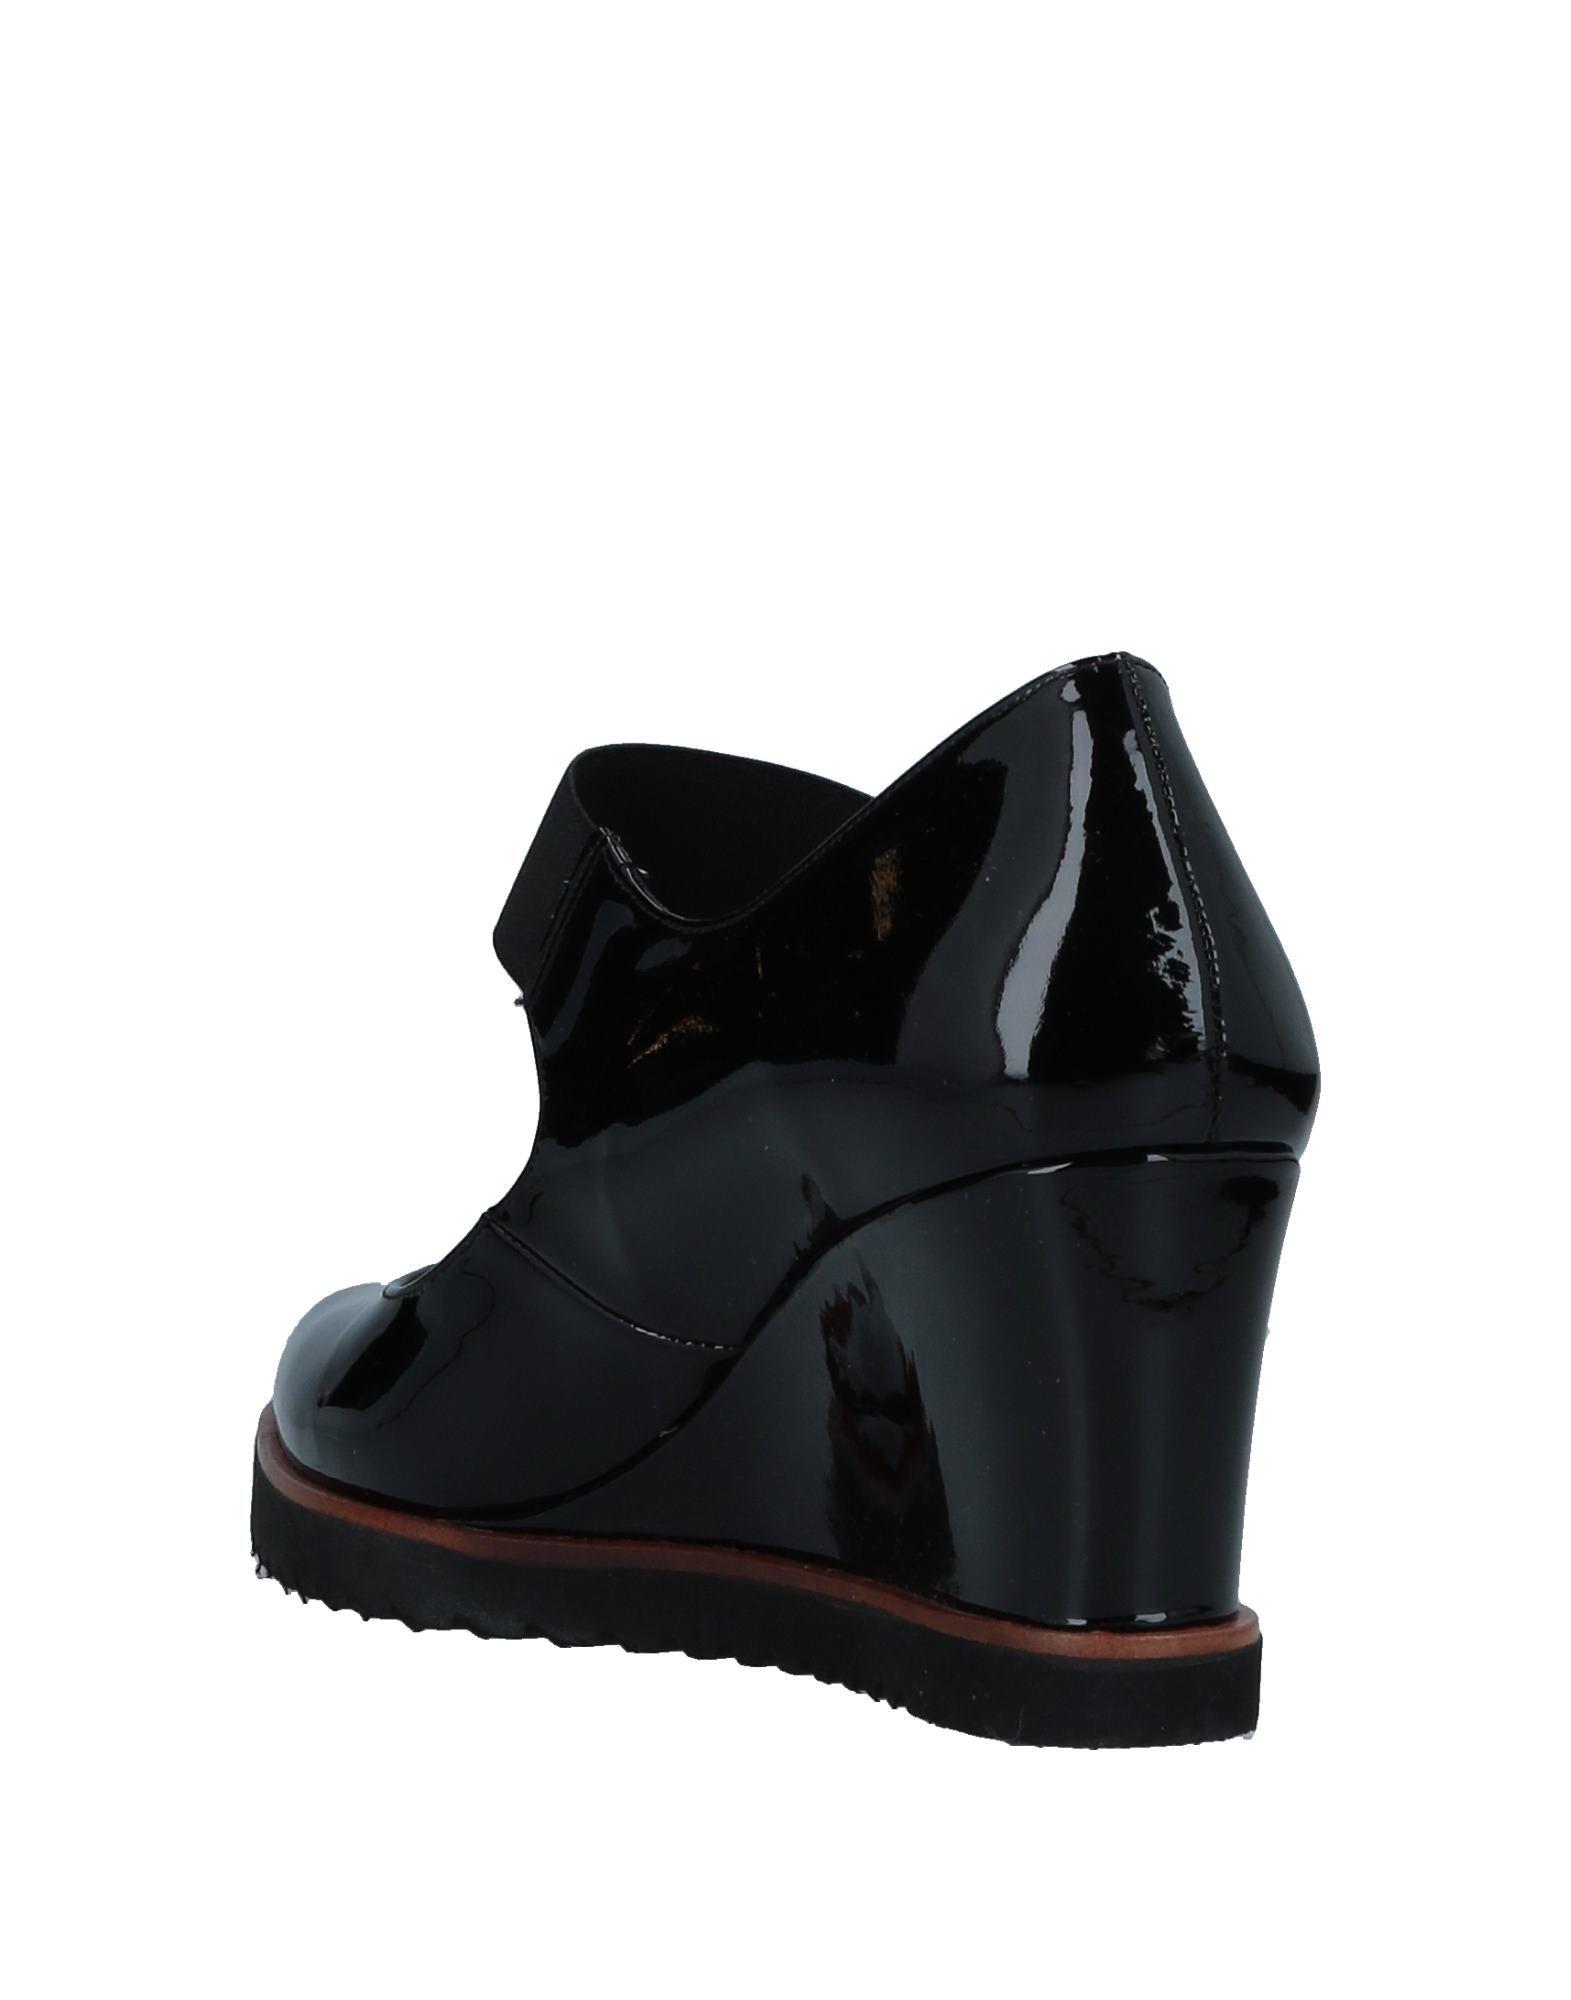 M&P Maypol Pumps Damen Damen Pumps  11531530LA Gute Qualität beliebte Schuhe 218702